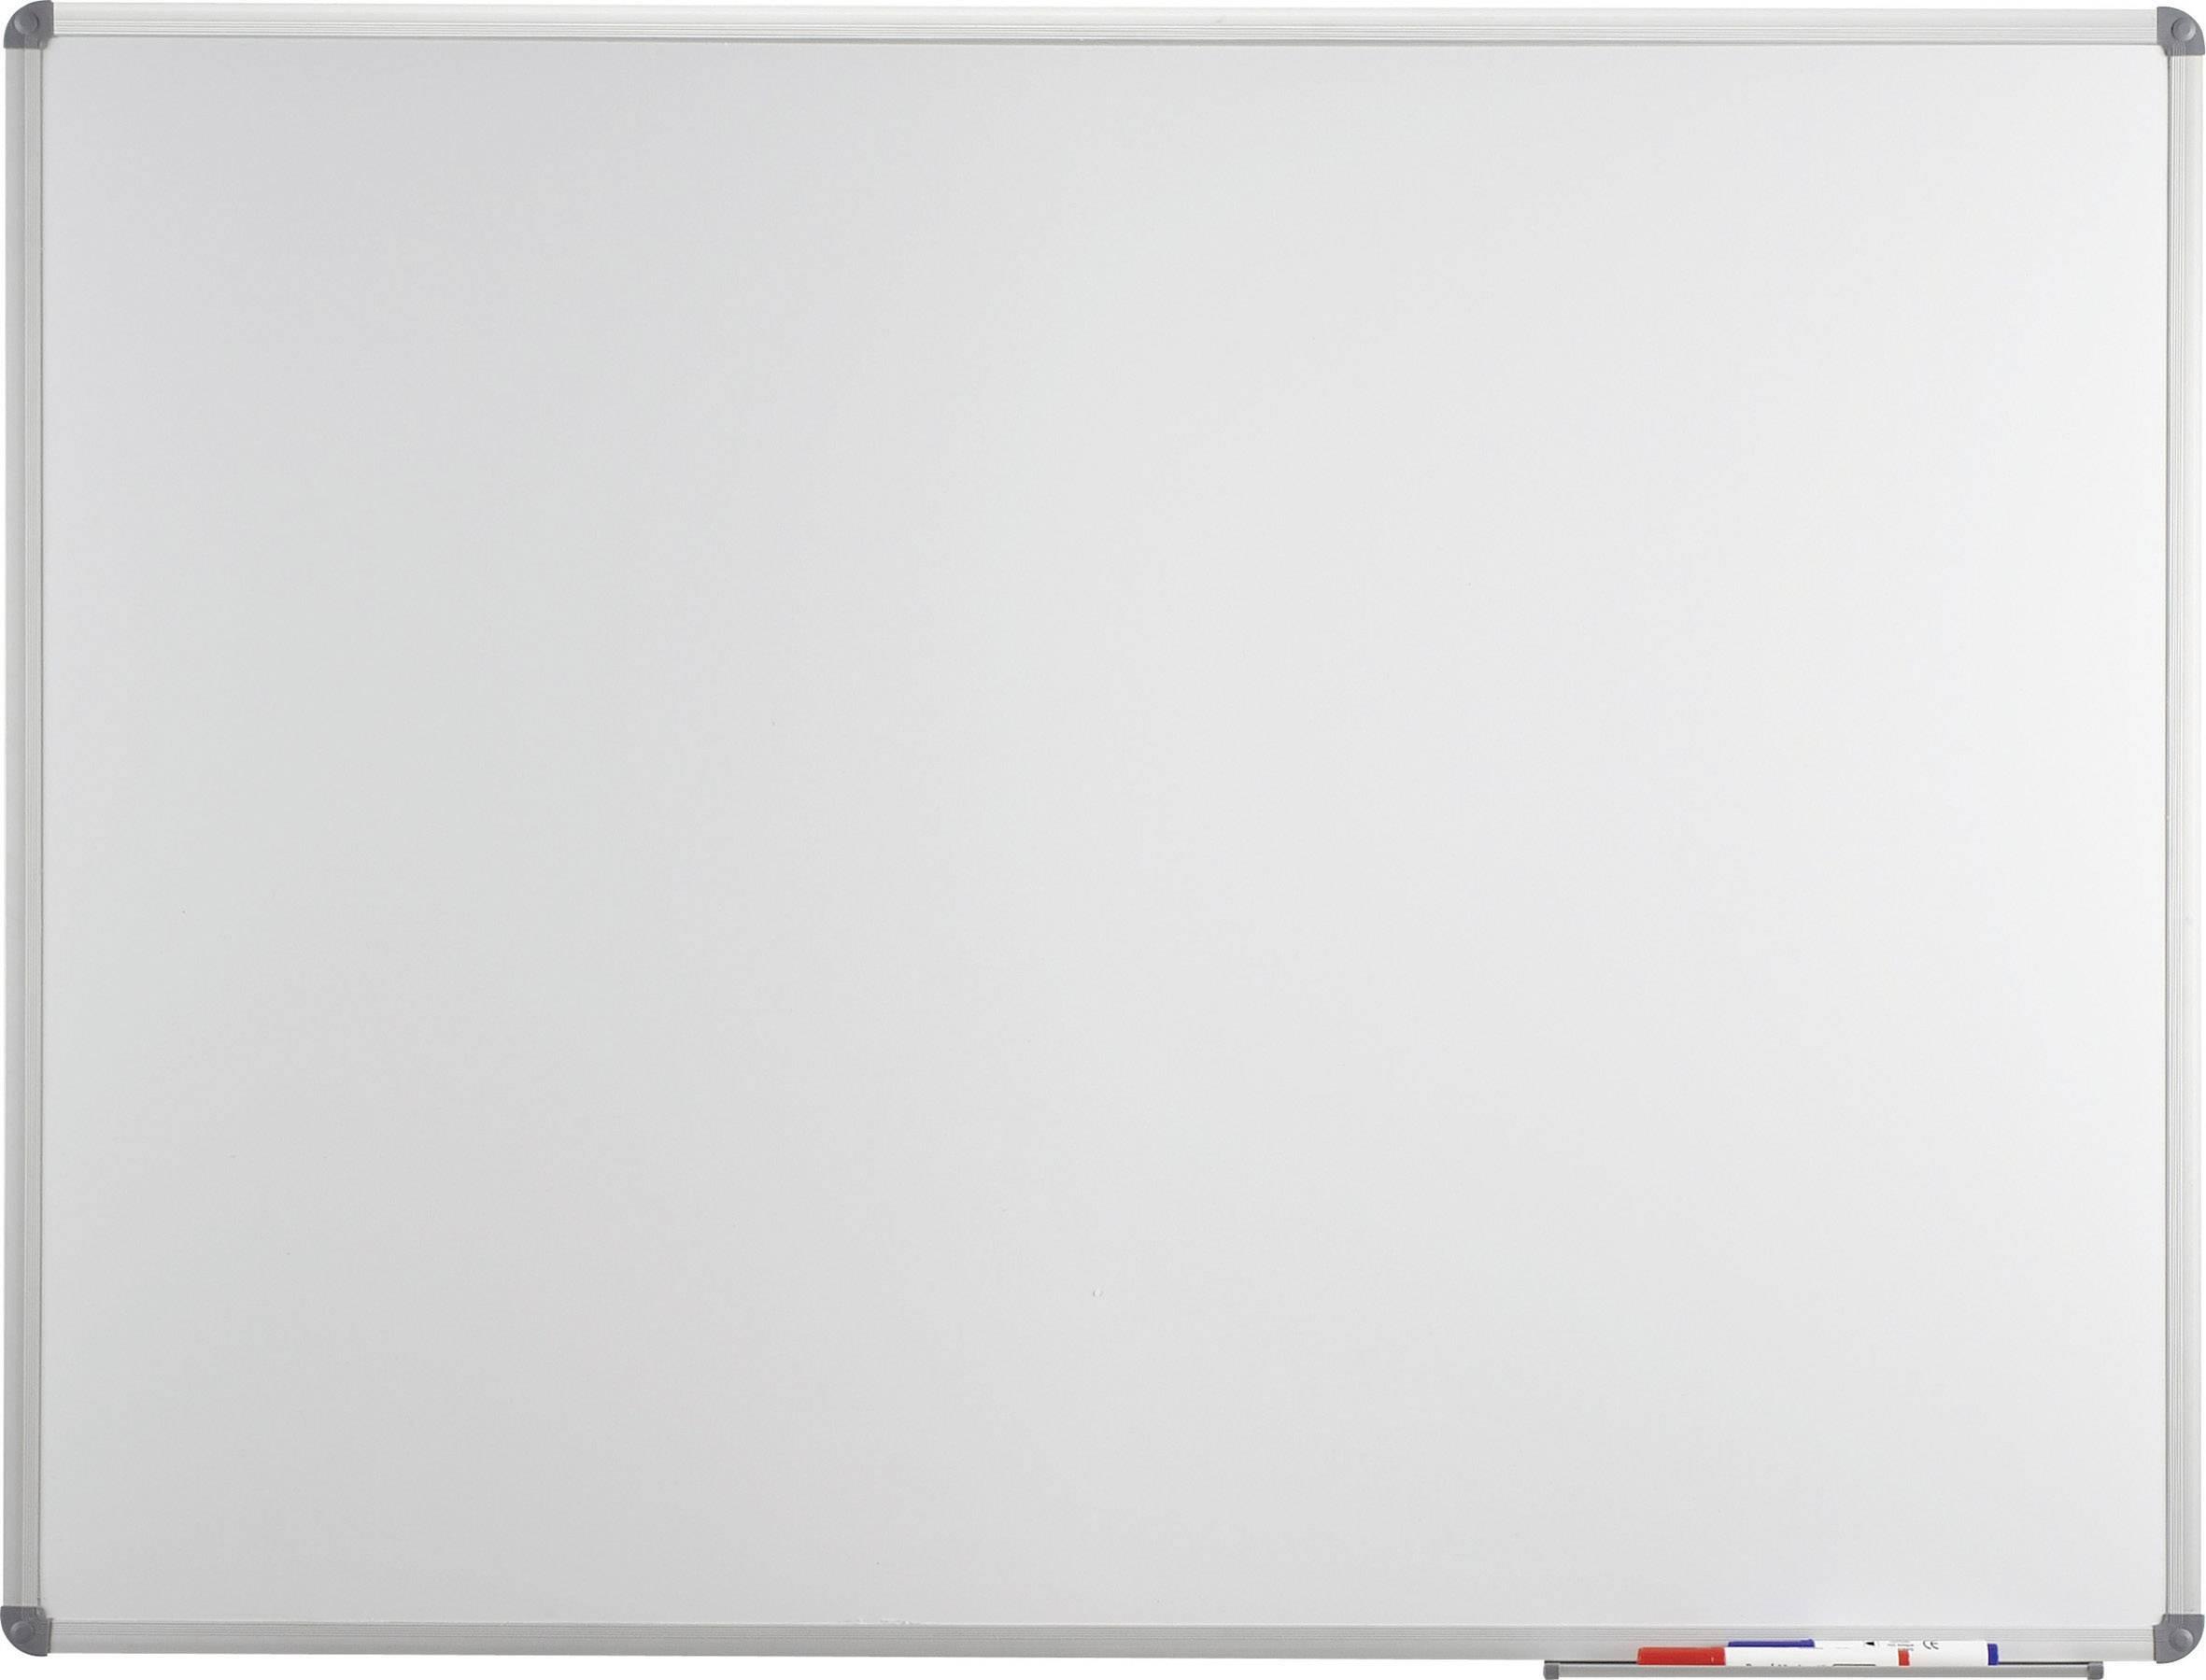 Maul Whiteboard Maulstandard B X H 120 Cm X 90 Cm Weiß